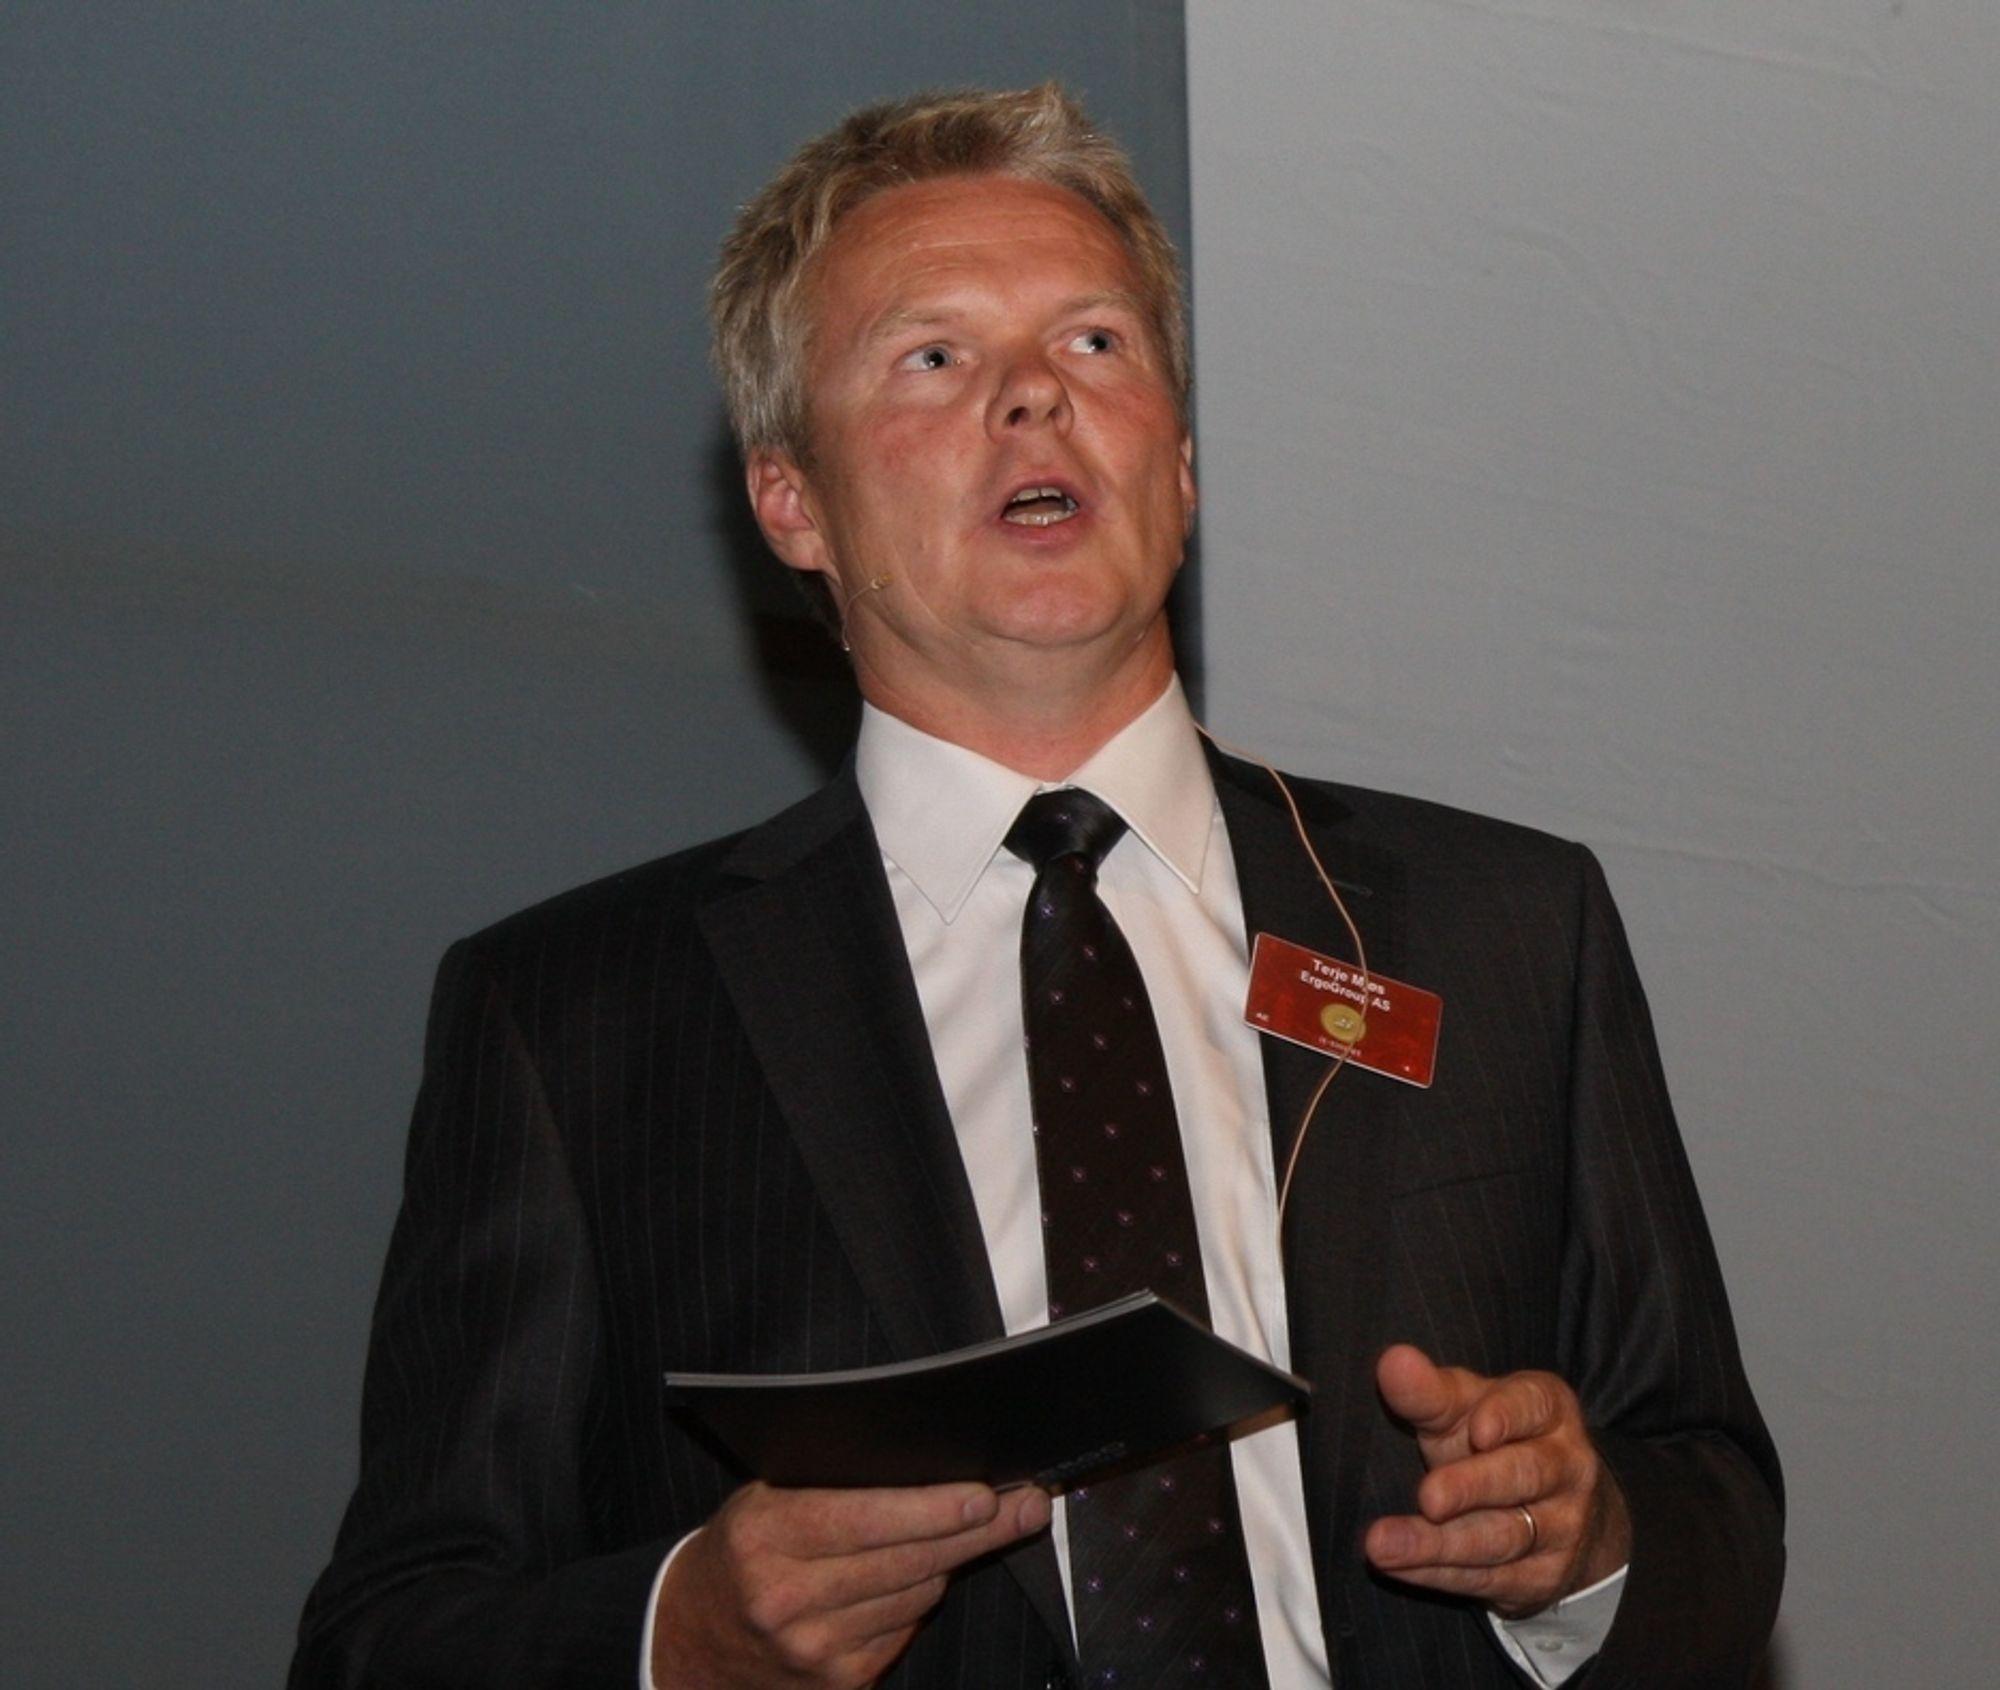 Administrerende direktør Terje Mjøs i Ergo Group.